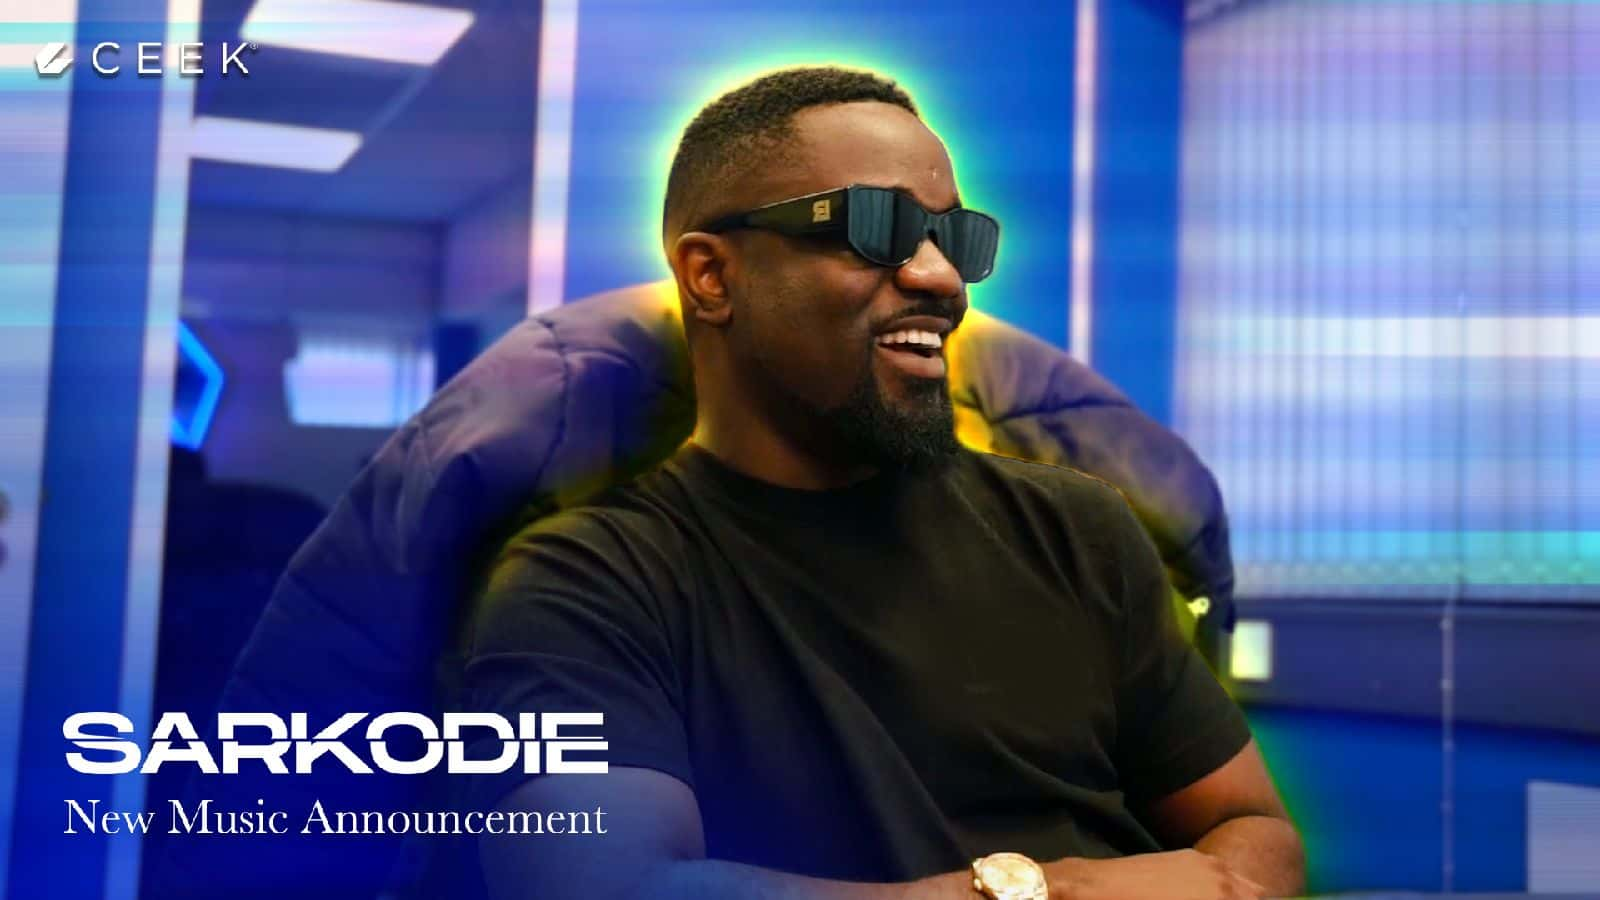 Sarkodie New Music Announcement